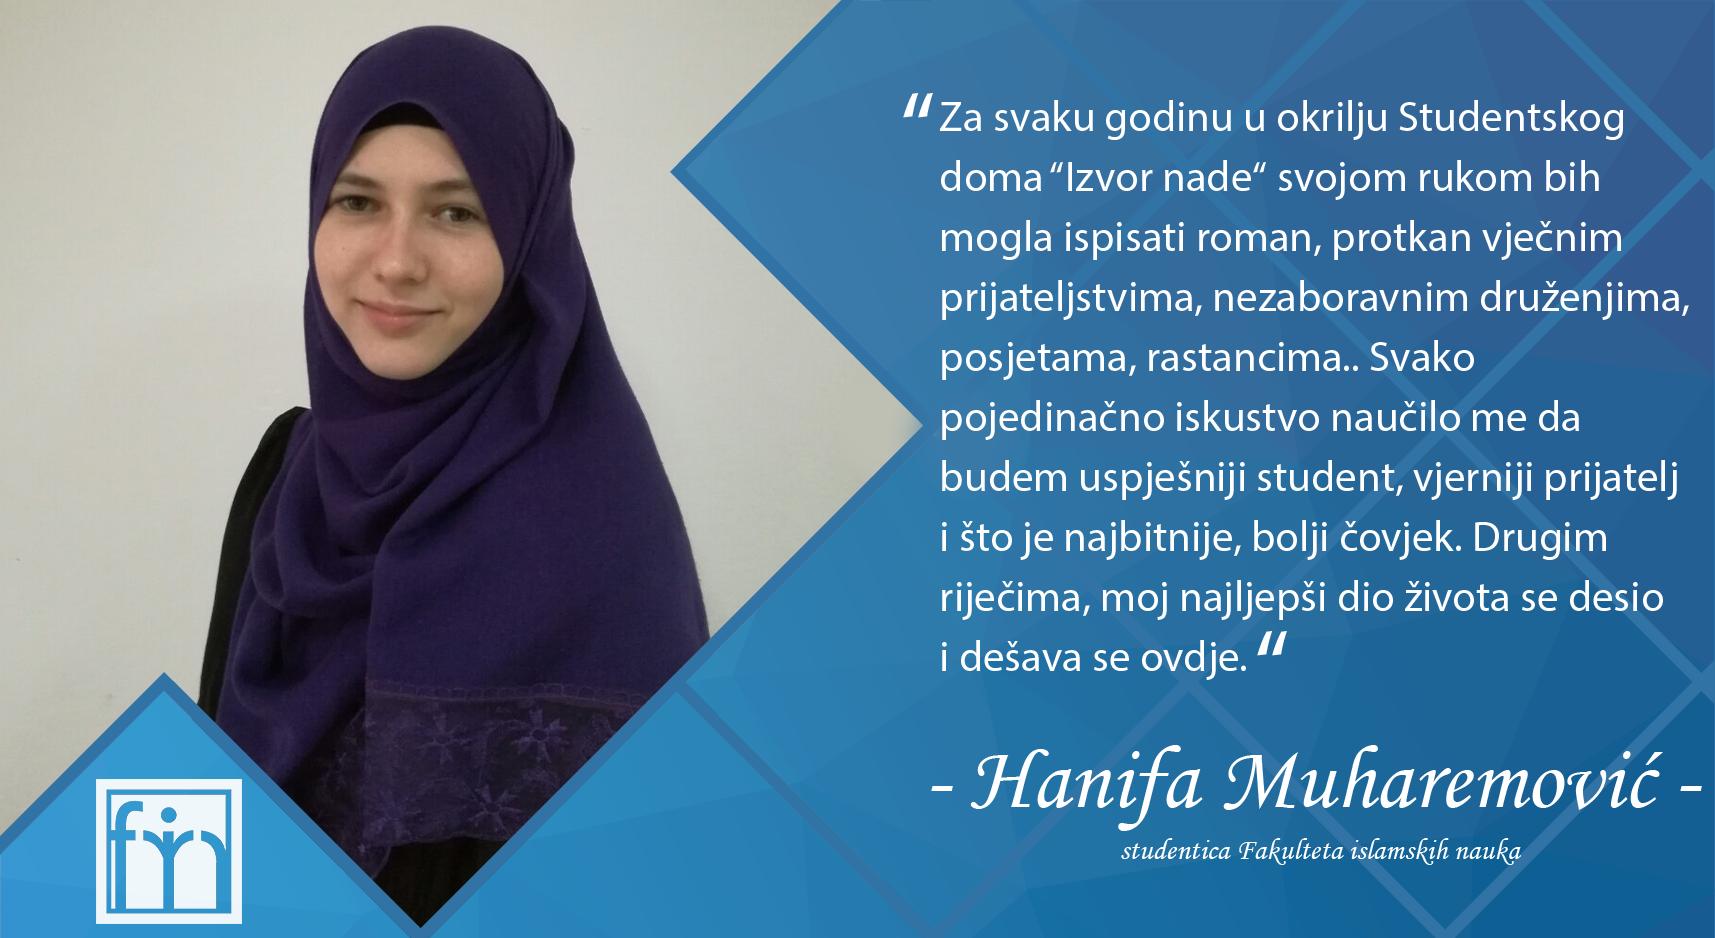 Hanifa_Muharemovic_Izvor_nade